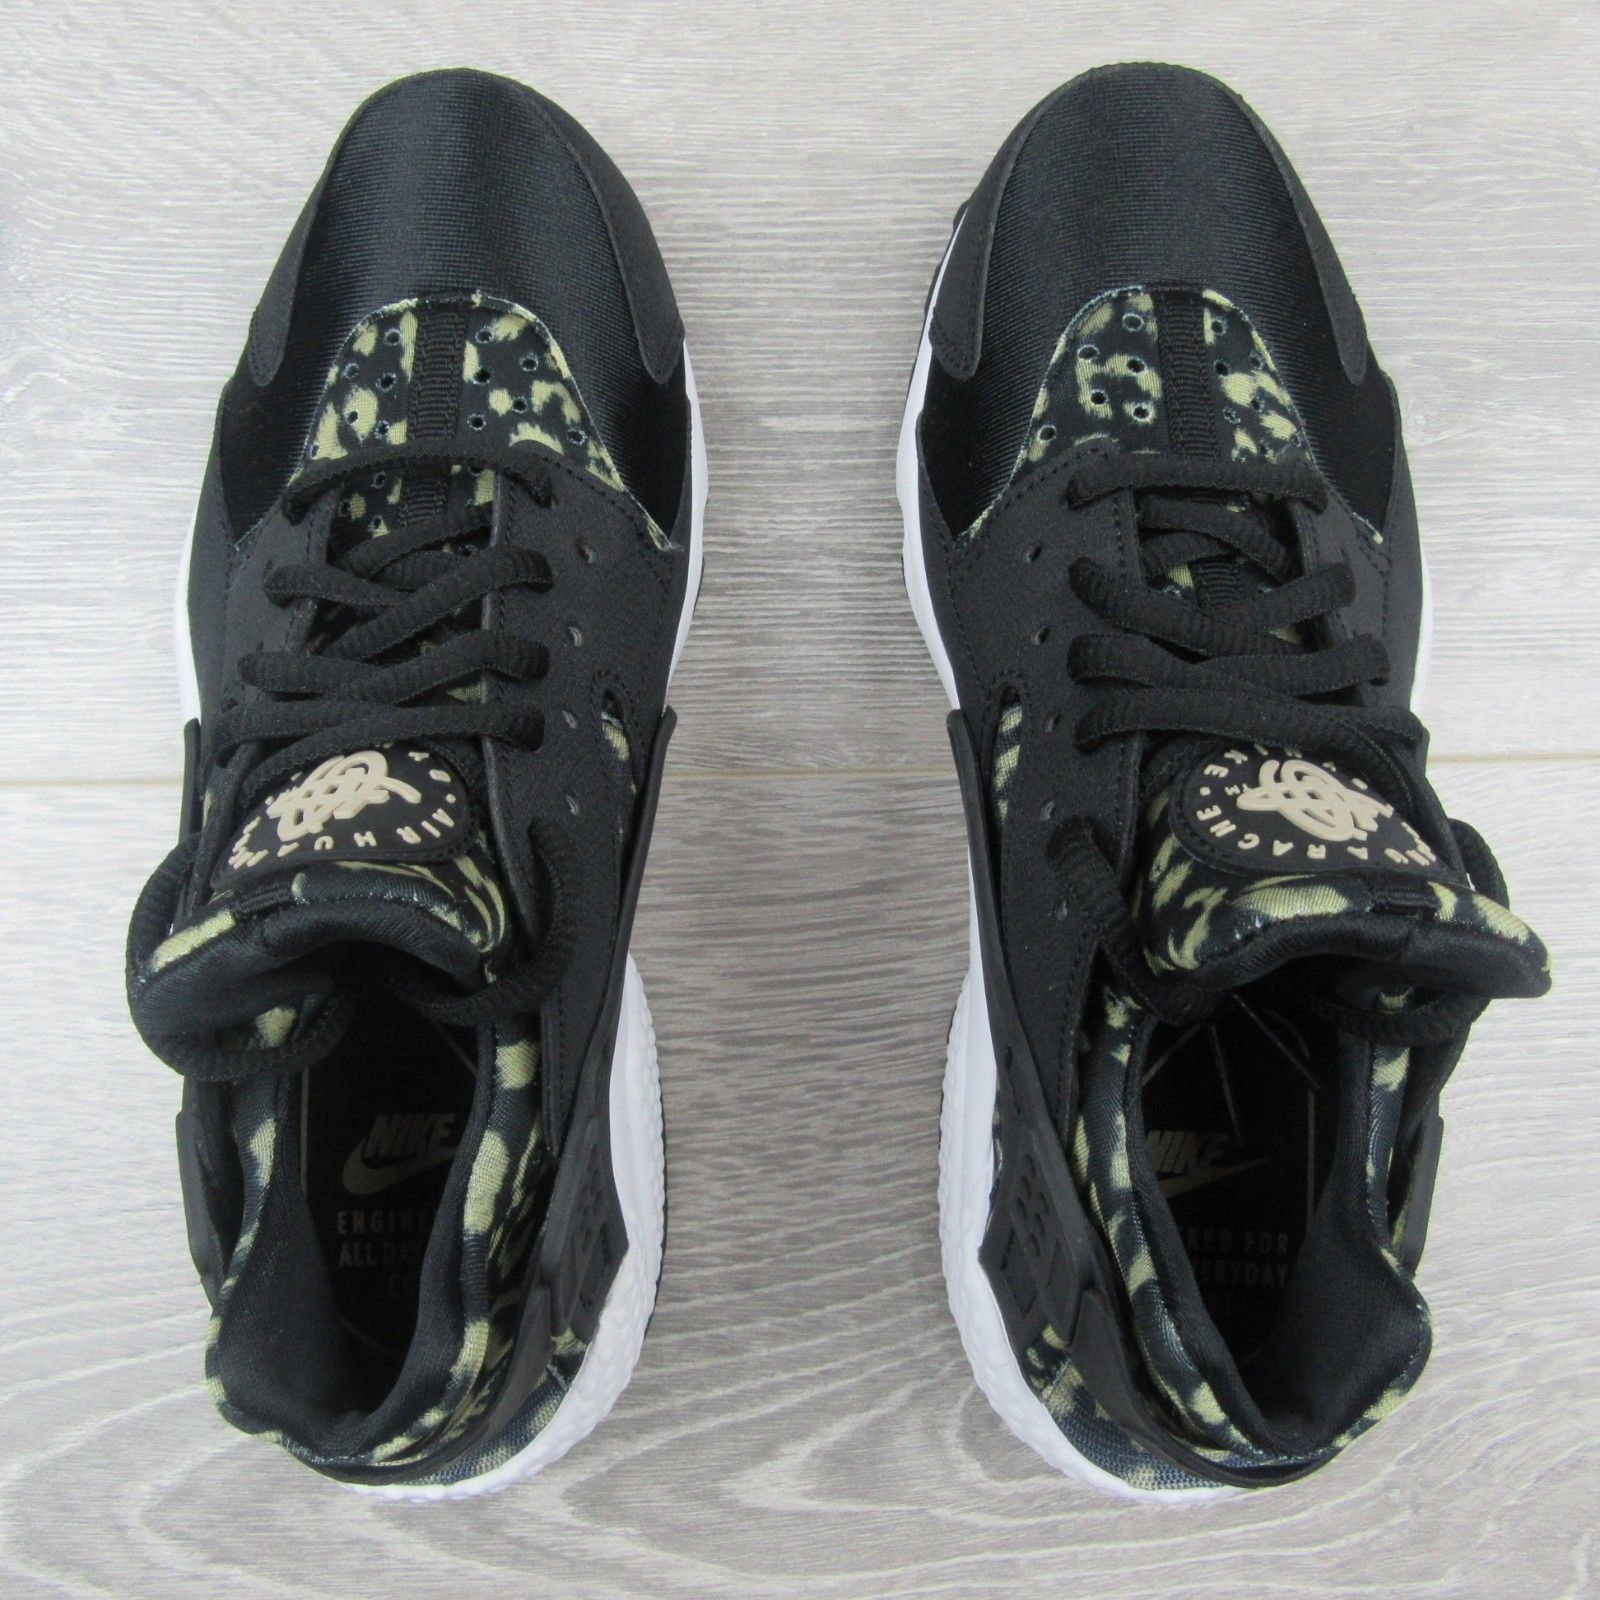 6707abc84fa95 Nike Air Huarache Shoes Size 6.5 Womens Leopard Print Black Beige New  725076 007